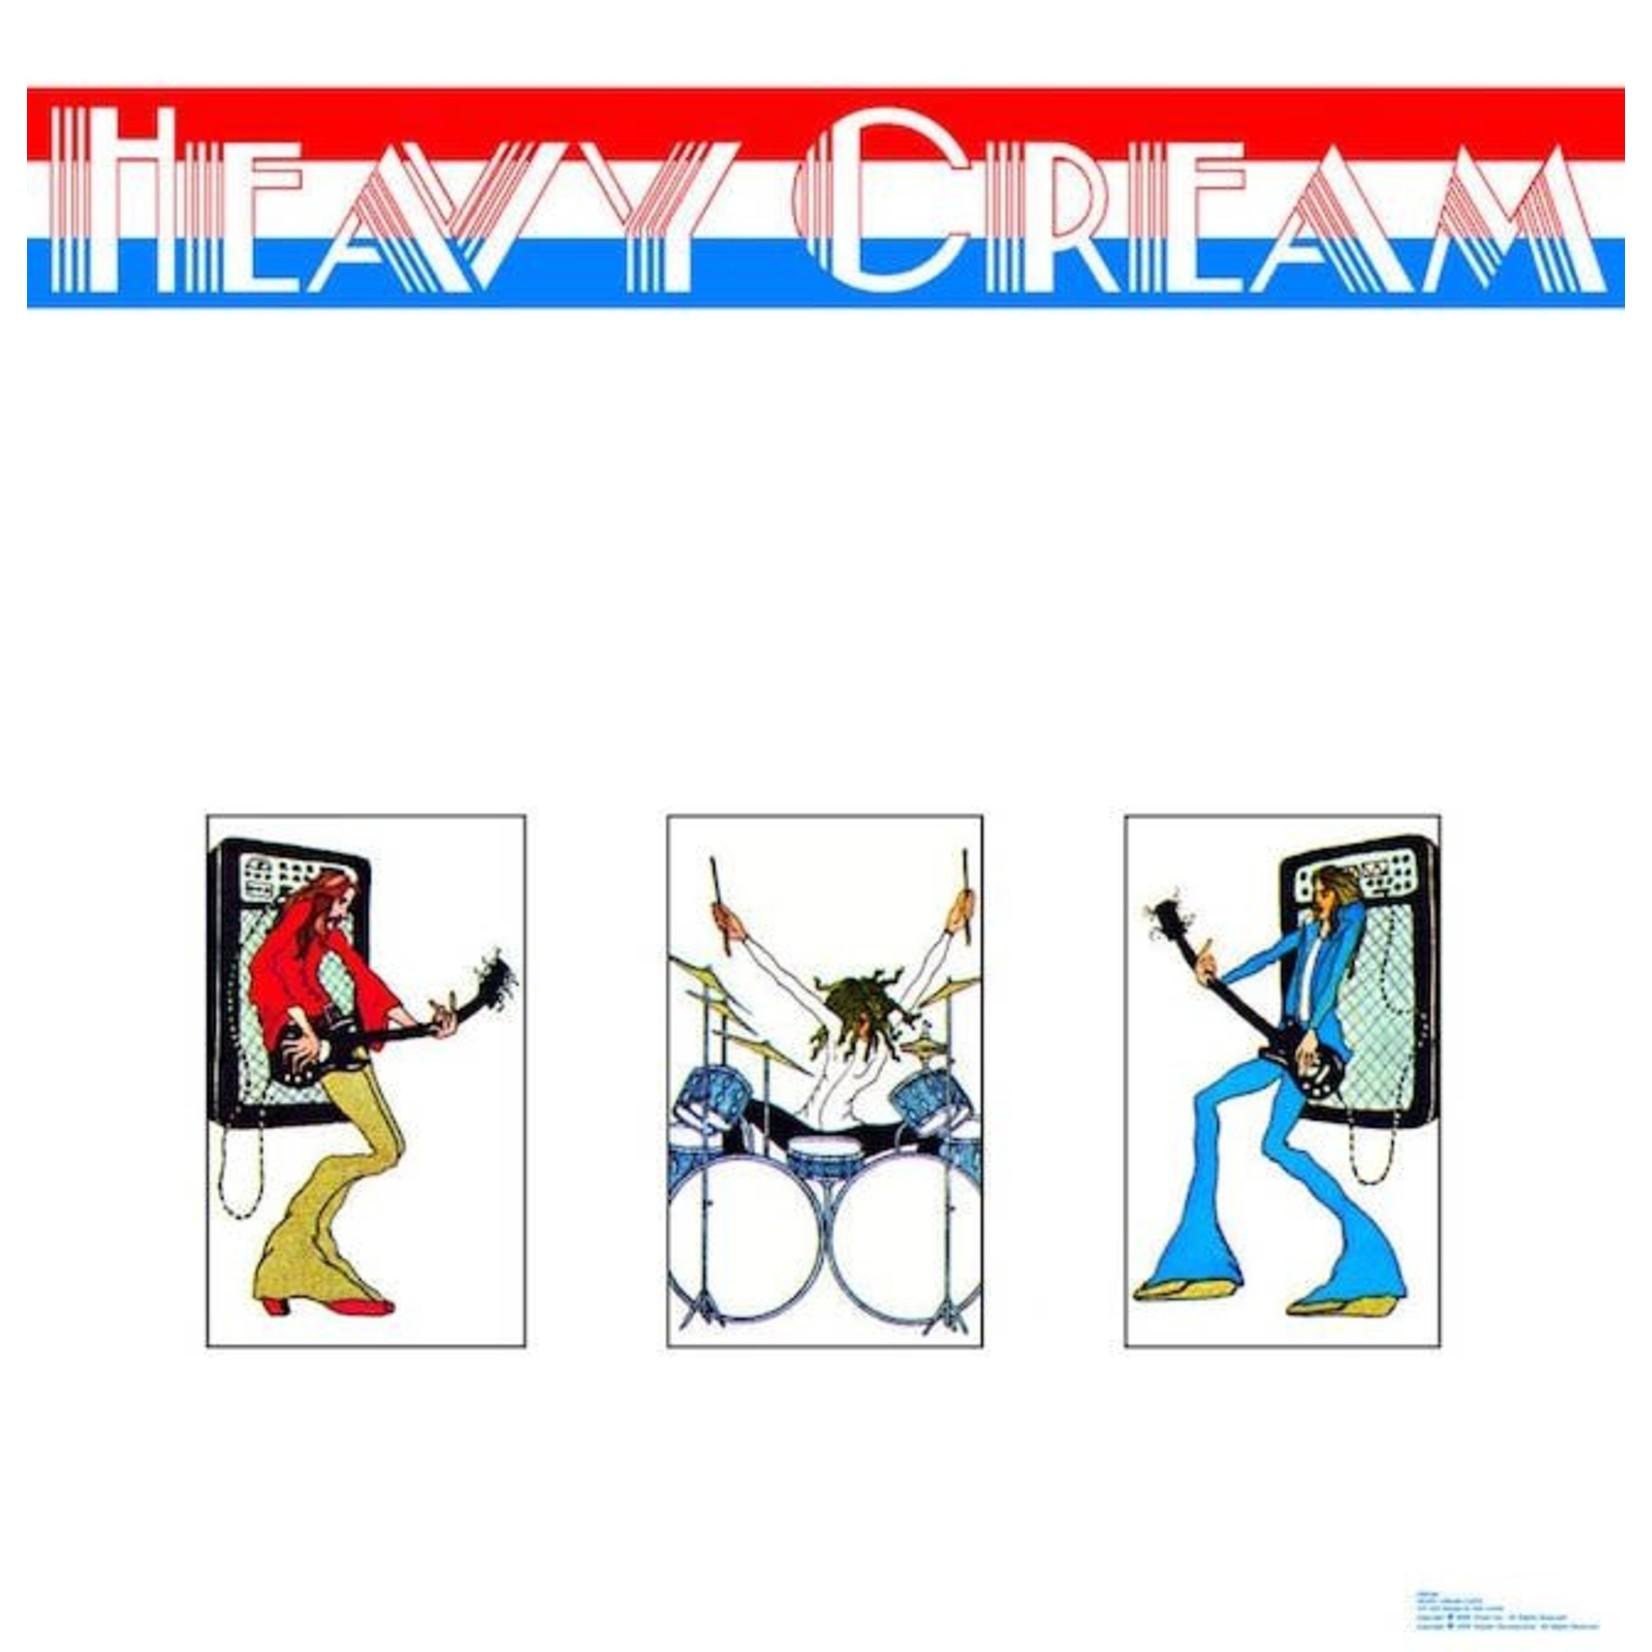 [Vintage] Cream: Heavy Cream (2LP)